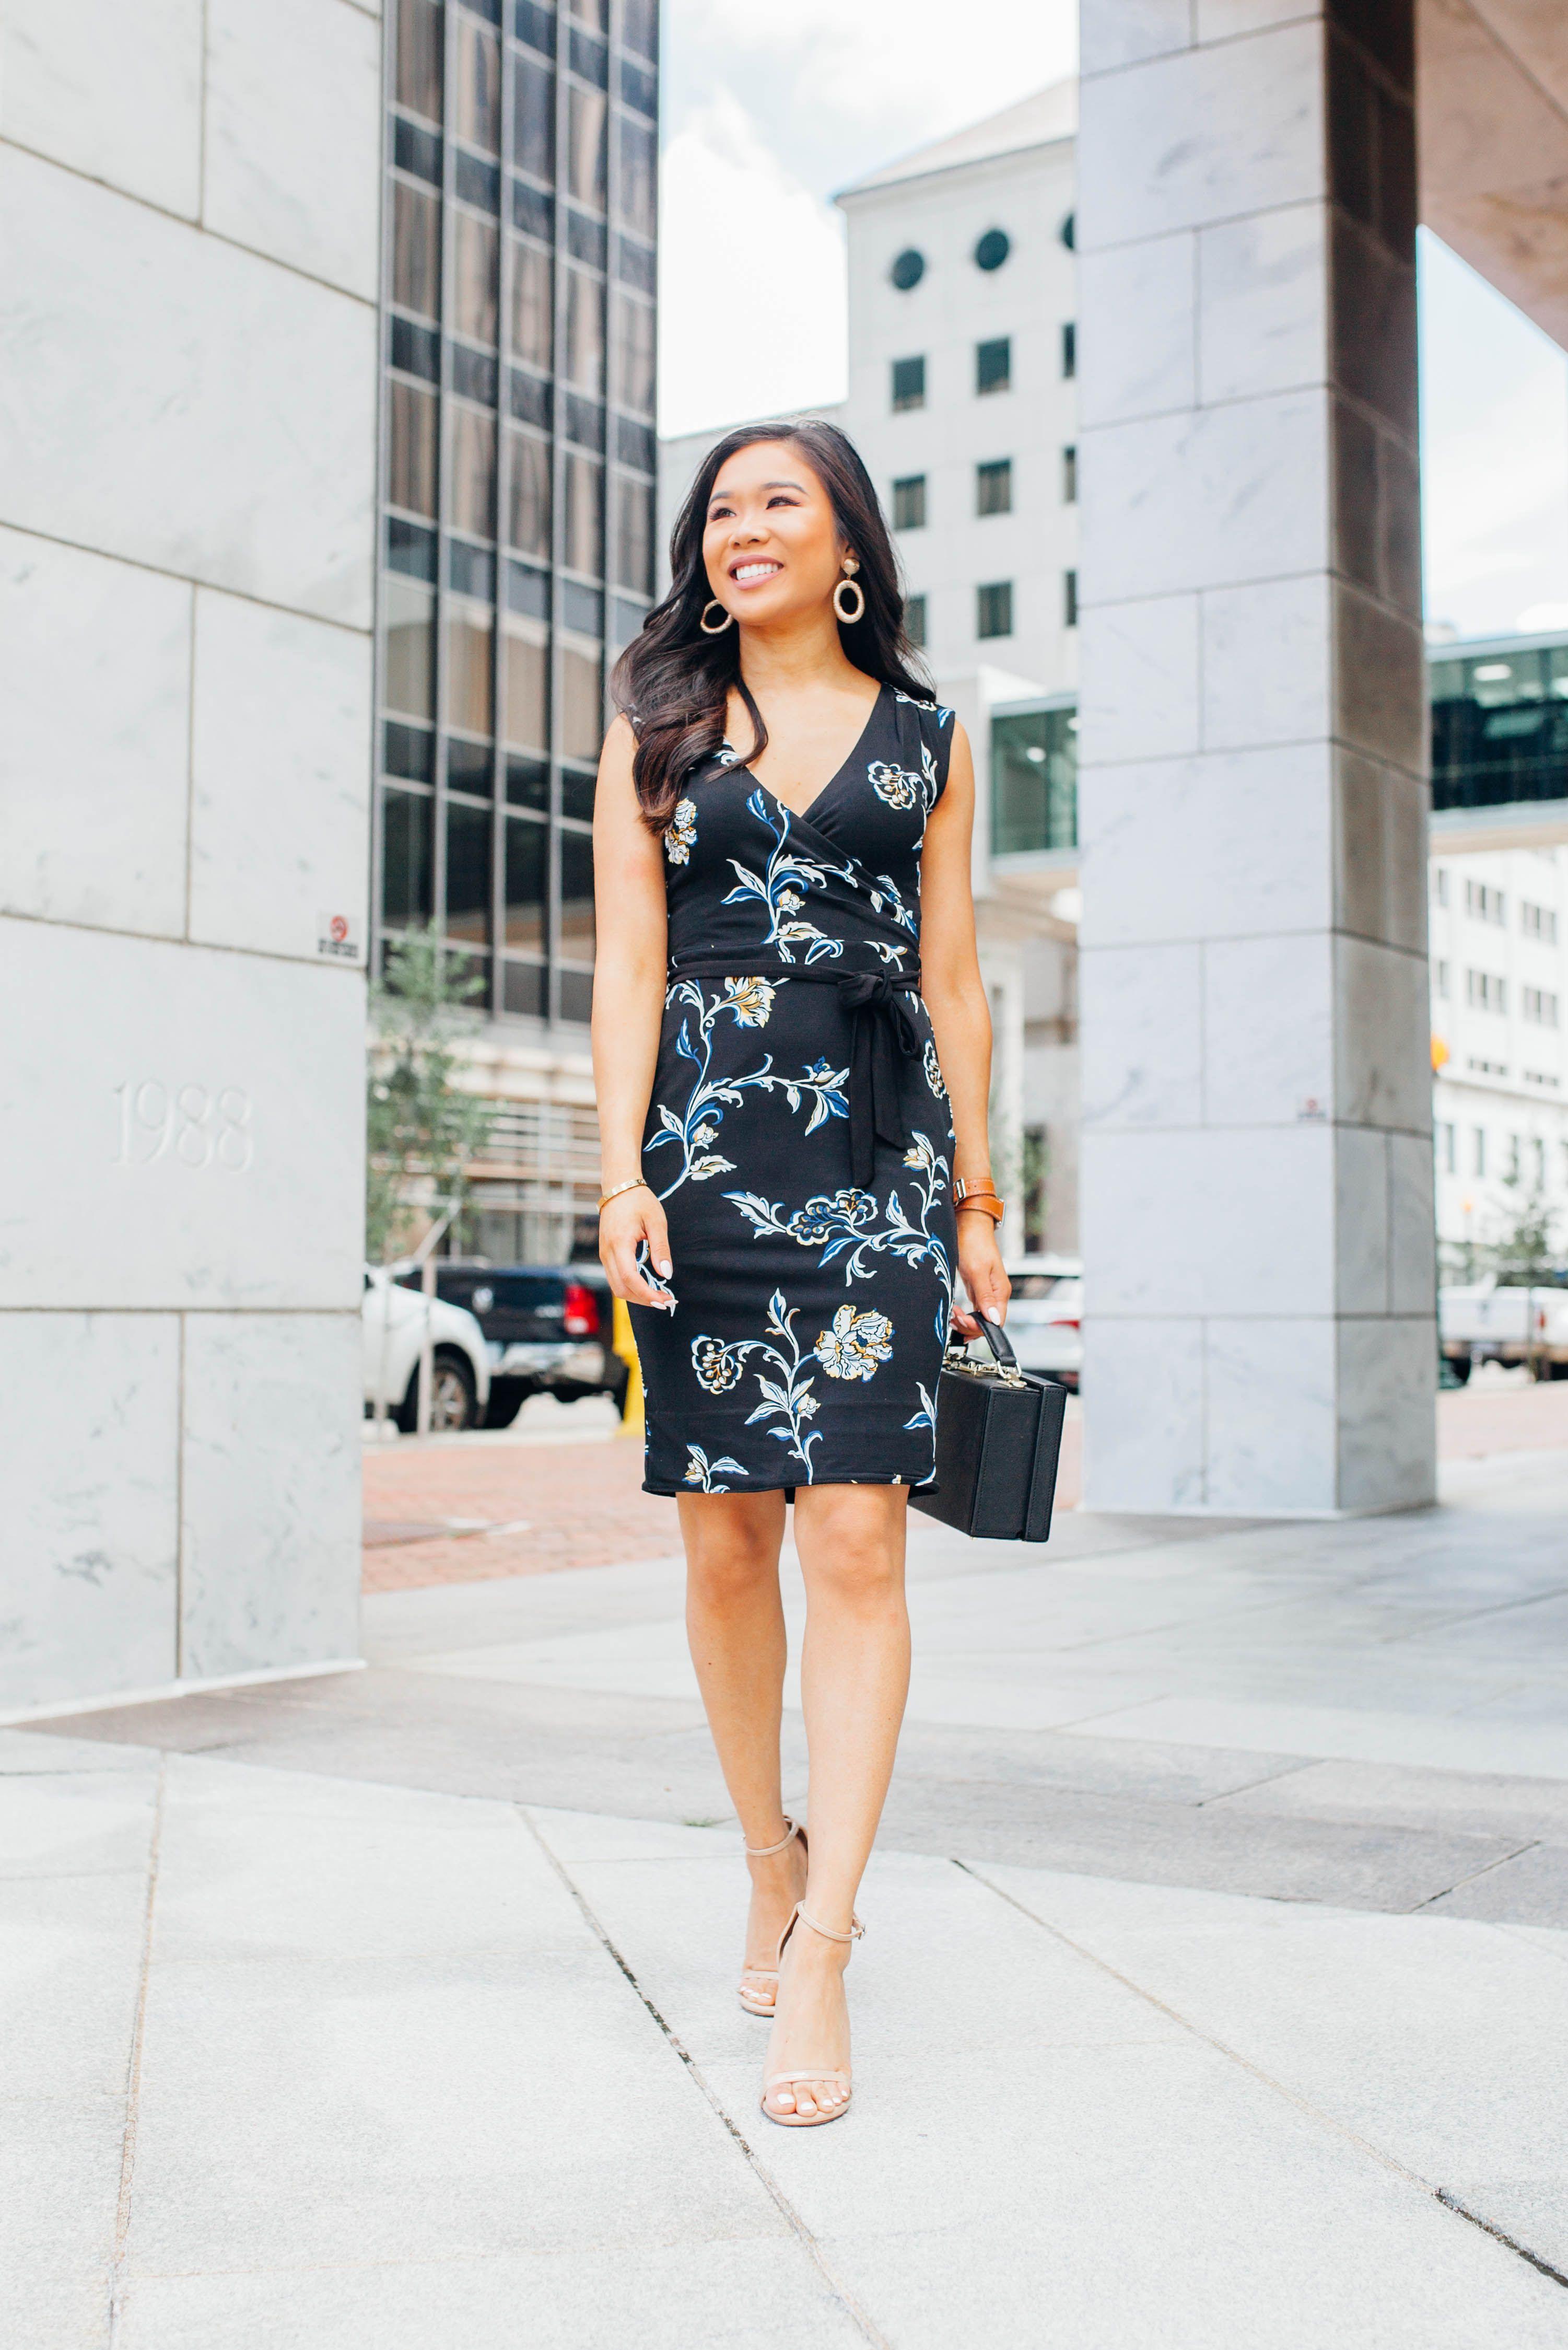 3964b6b77f45 Blogger Hoang-Kim wears a reversible floral surplice dress